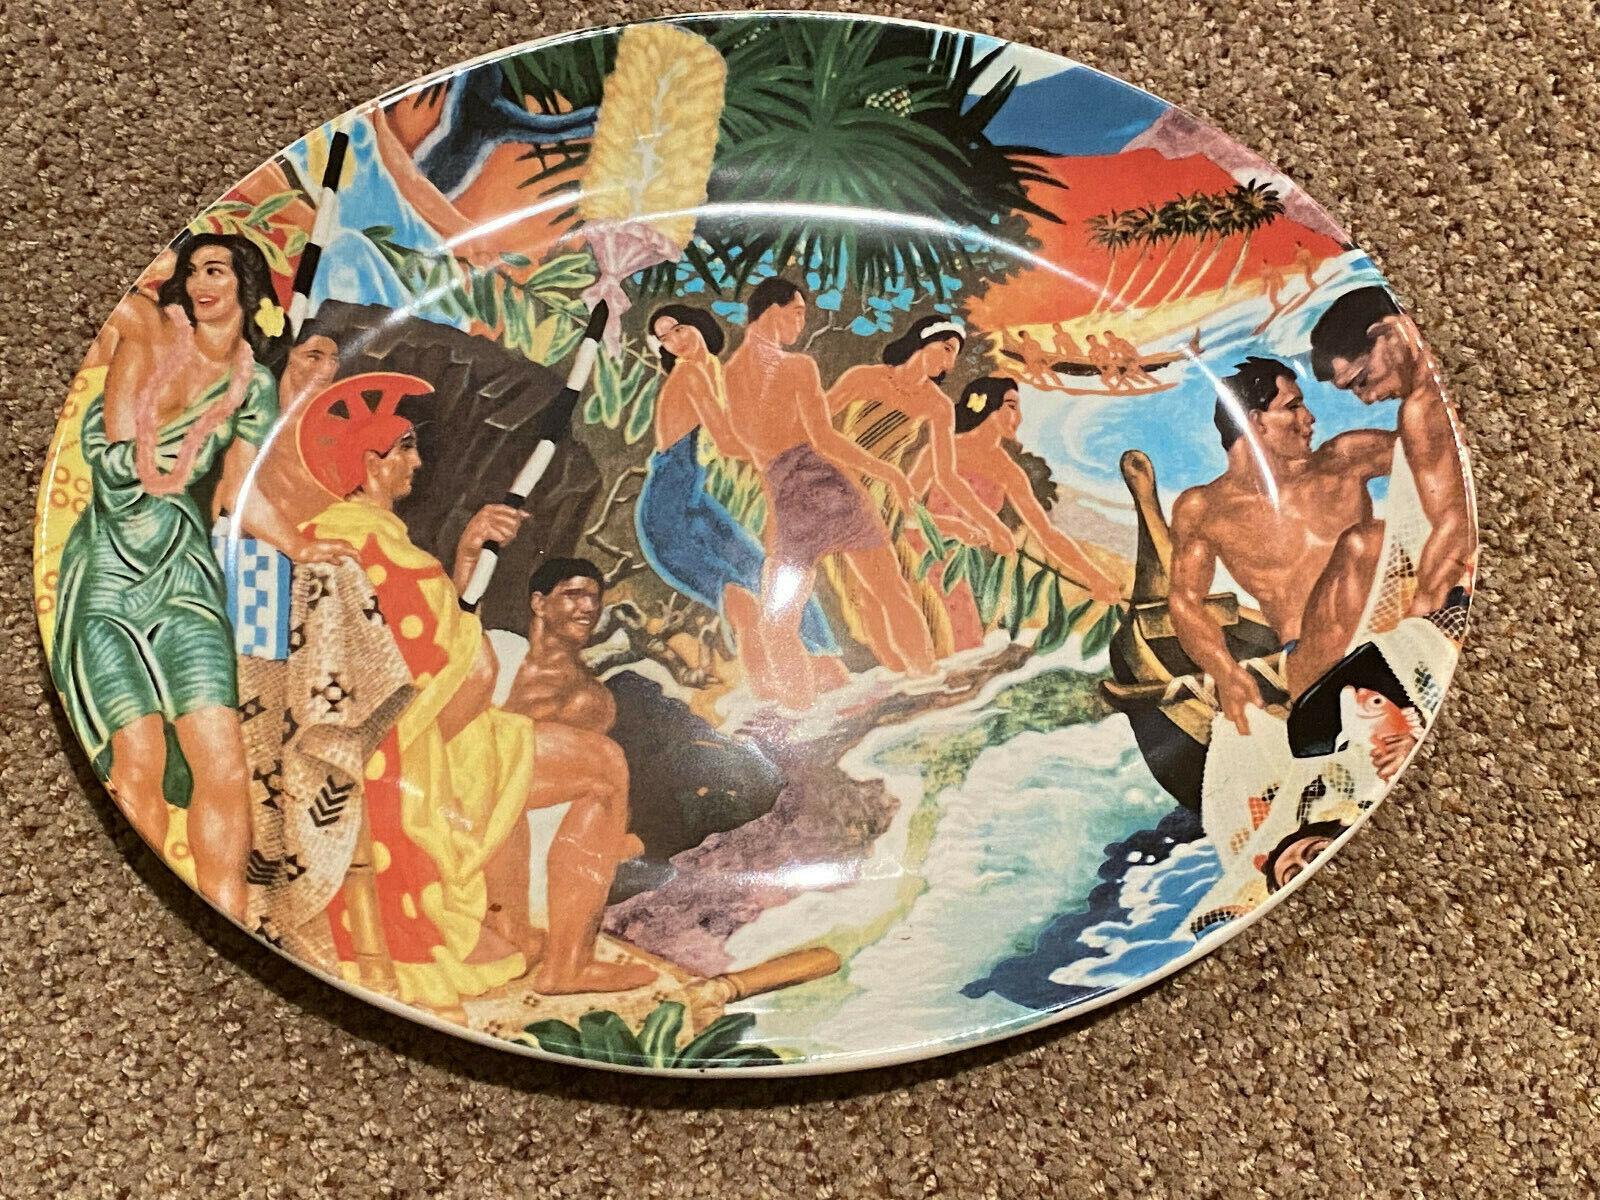 Vintage Hawiiana Ware, Lynn Krantz Oval Platter, Dishbooks Holmer Laughlin  - $75.00